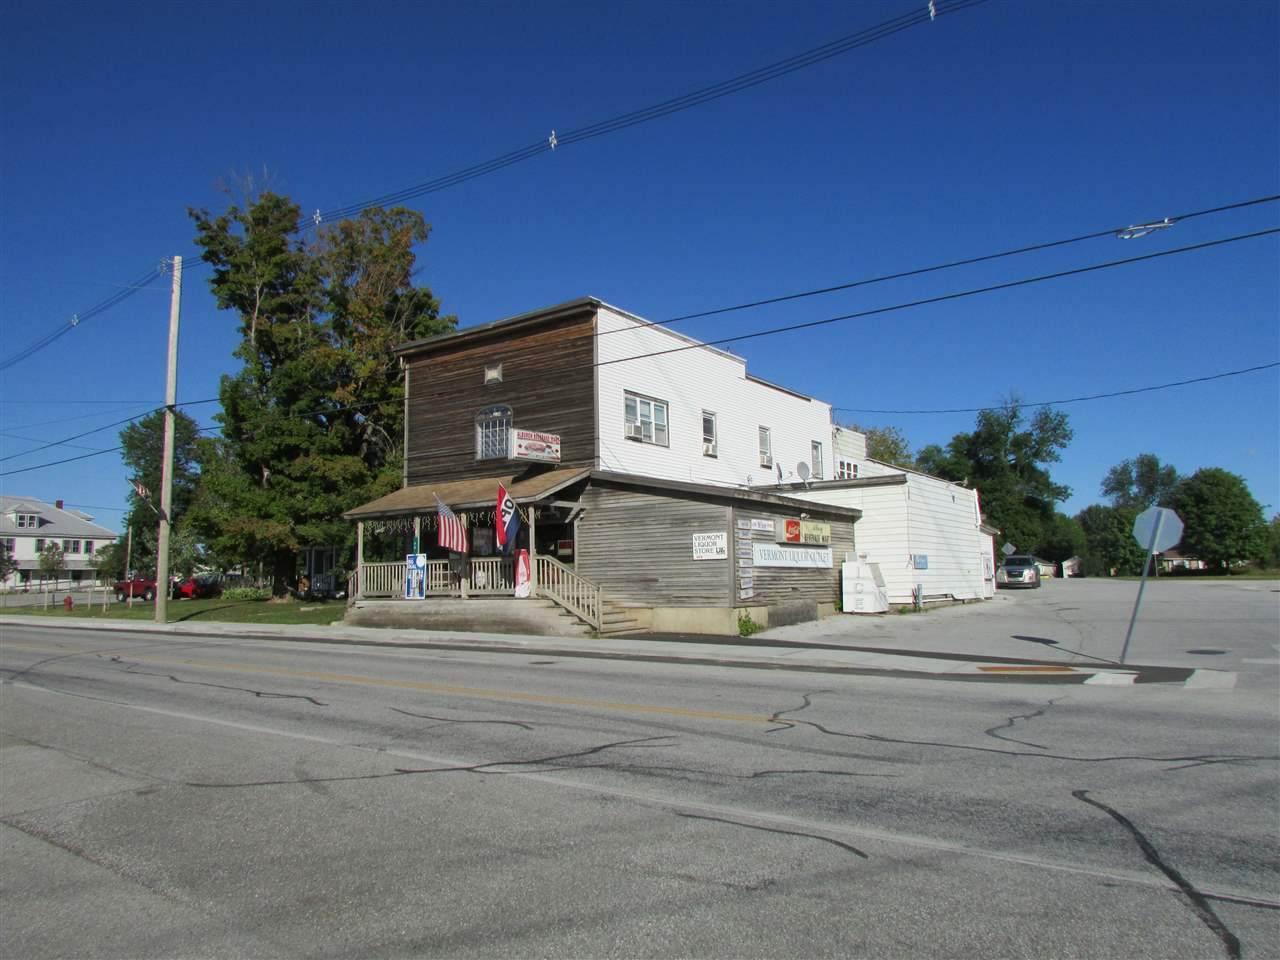 40 N. Main Street - Photo 1